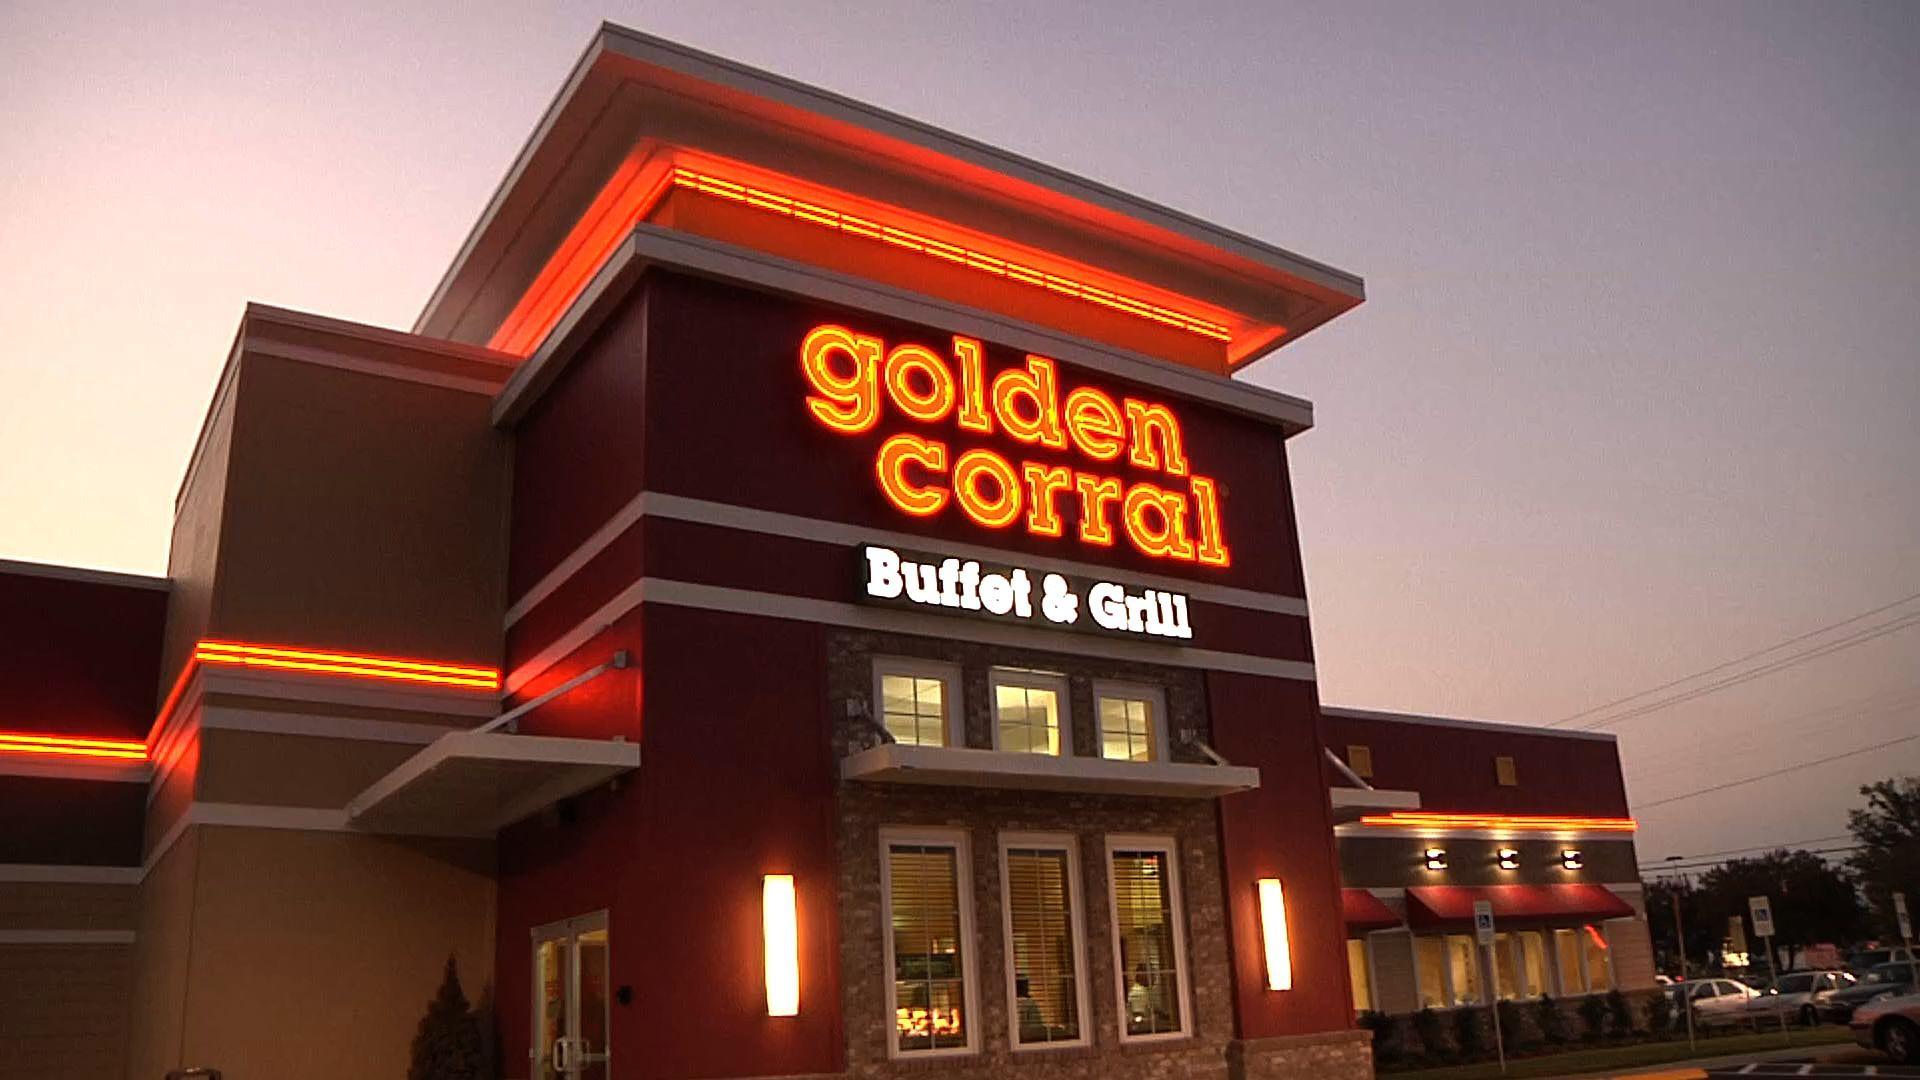 Vegan Options at Golden Corral Golden corral, Breakfast